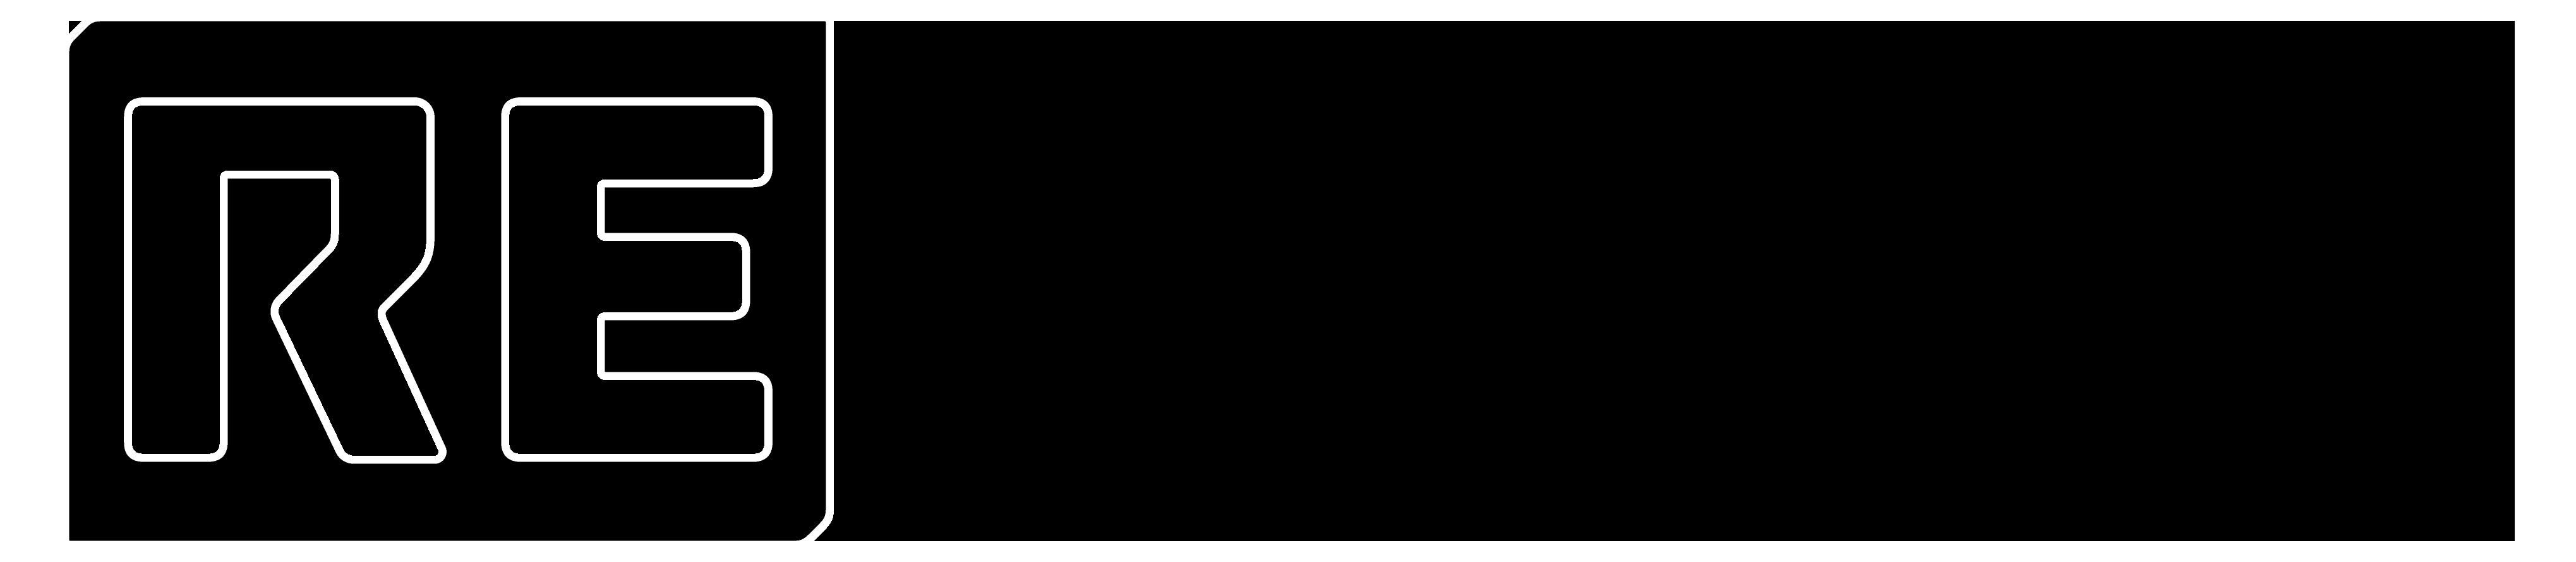 logo reboots